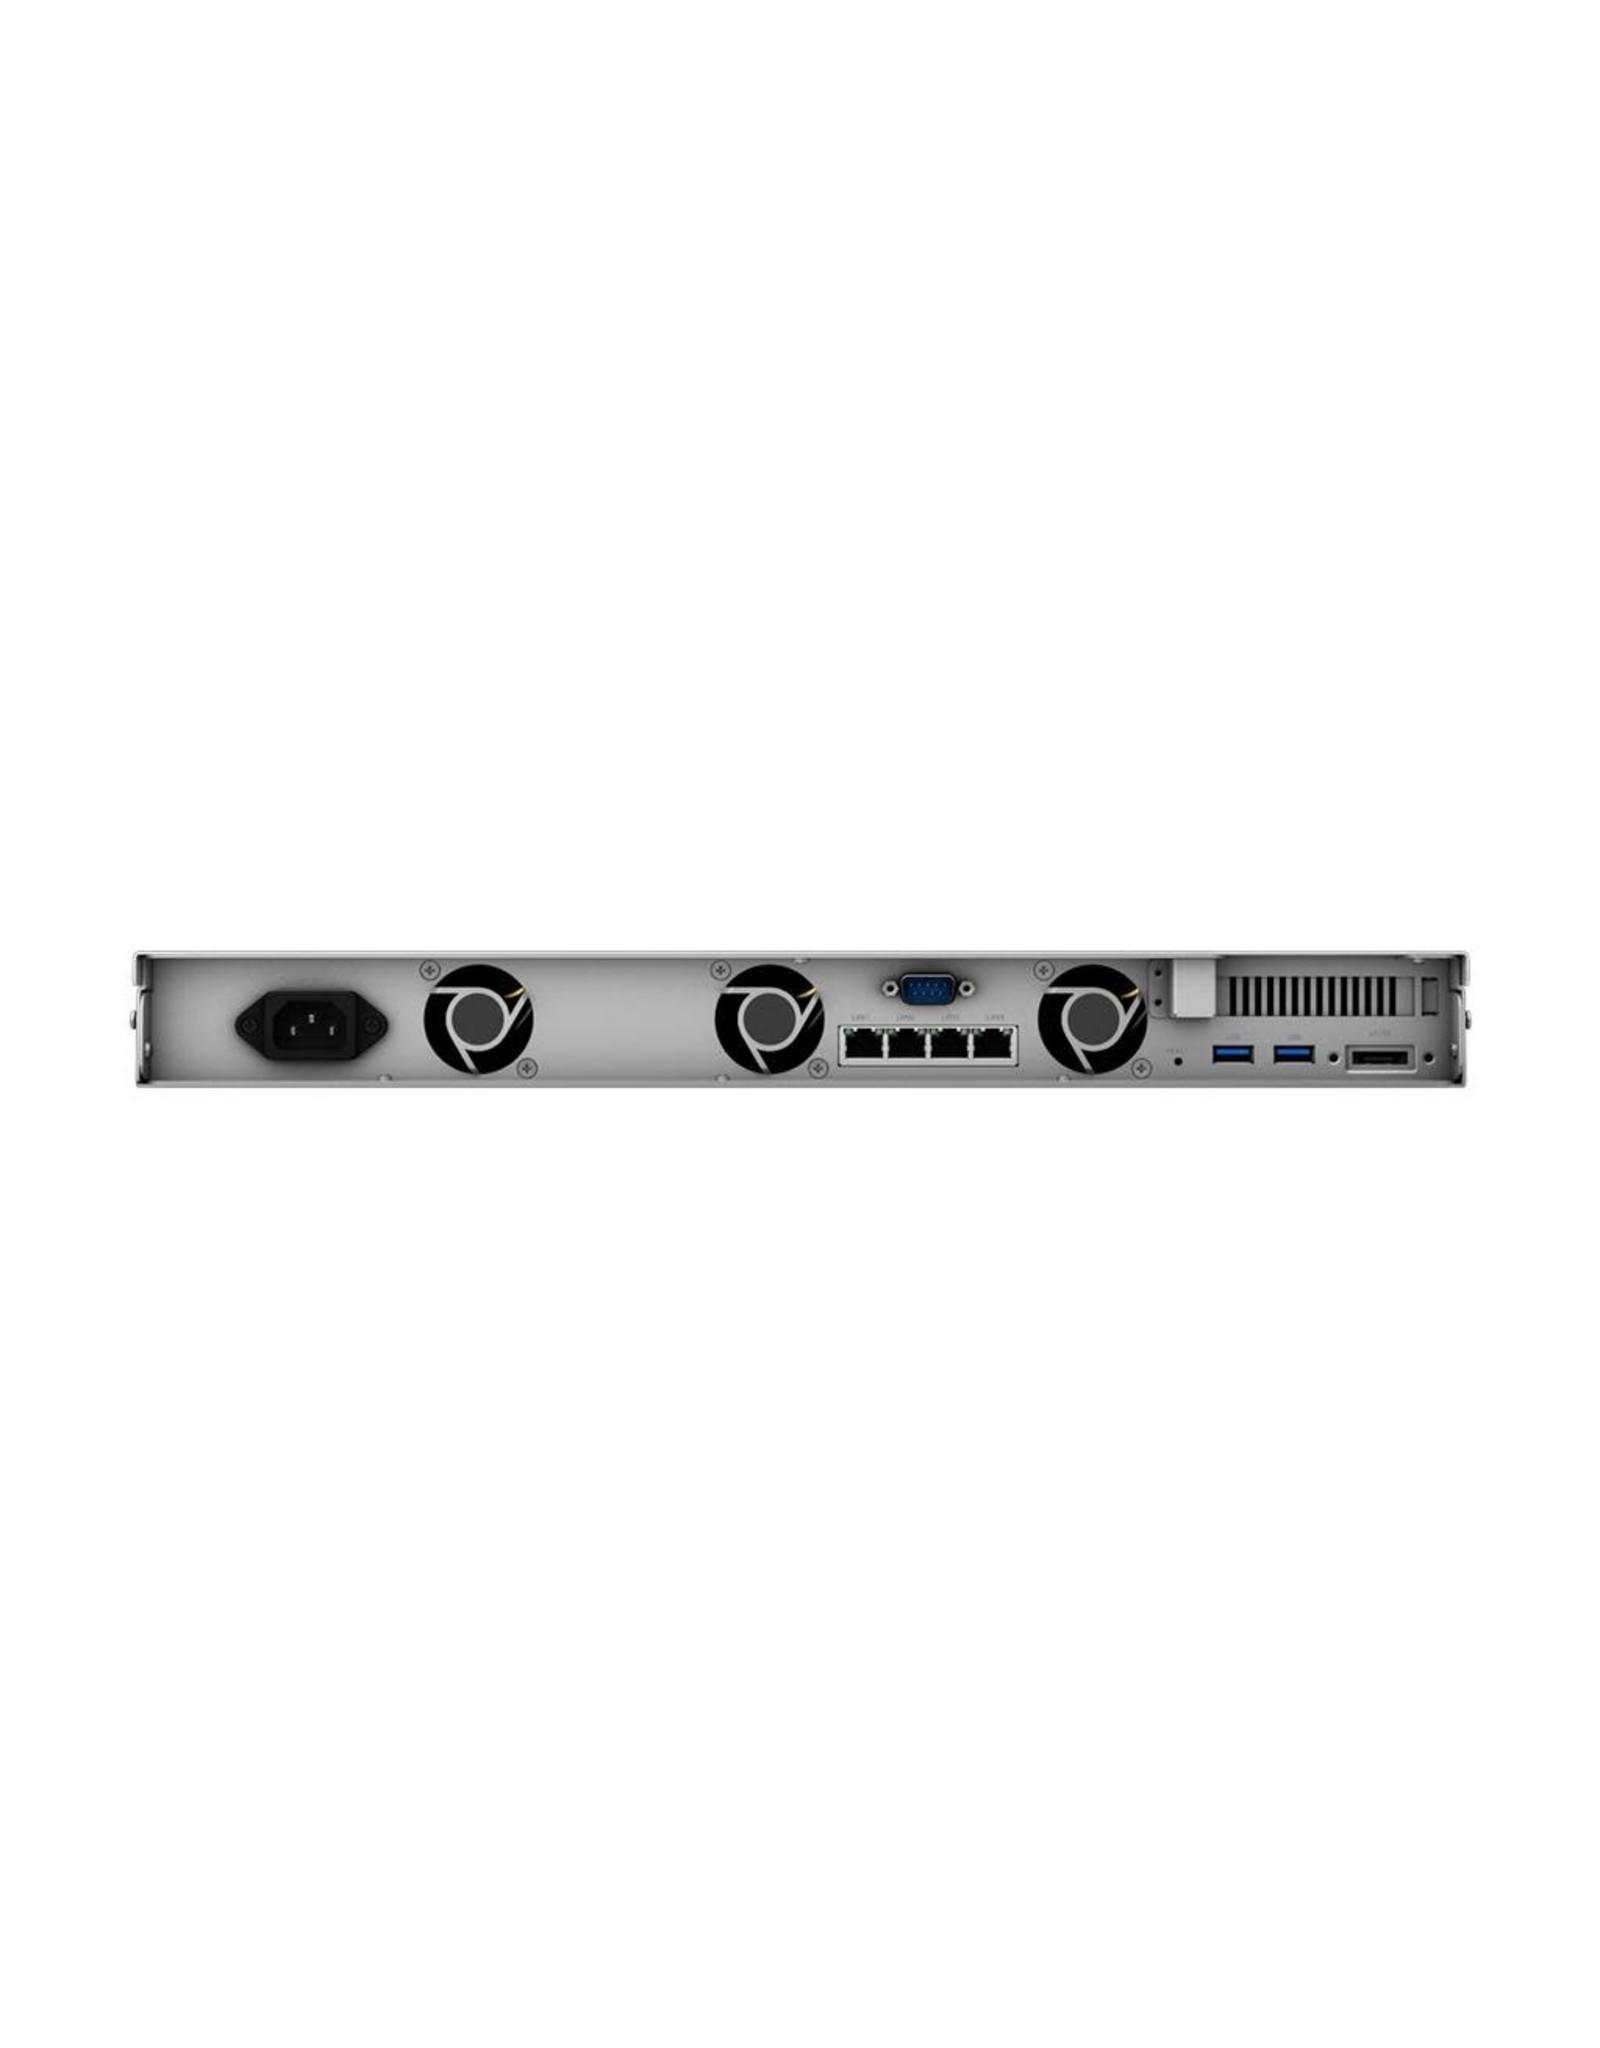 Synology Synology RS818+ 56TB 4-Bay 1RU High Performance 2.4GHz Quadcore NAS Server (4x14TB Value Enterprise HDD 5YR)